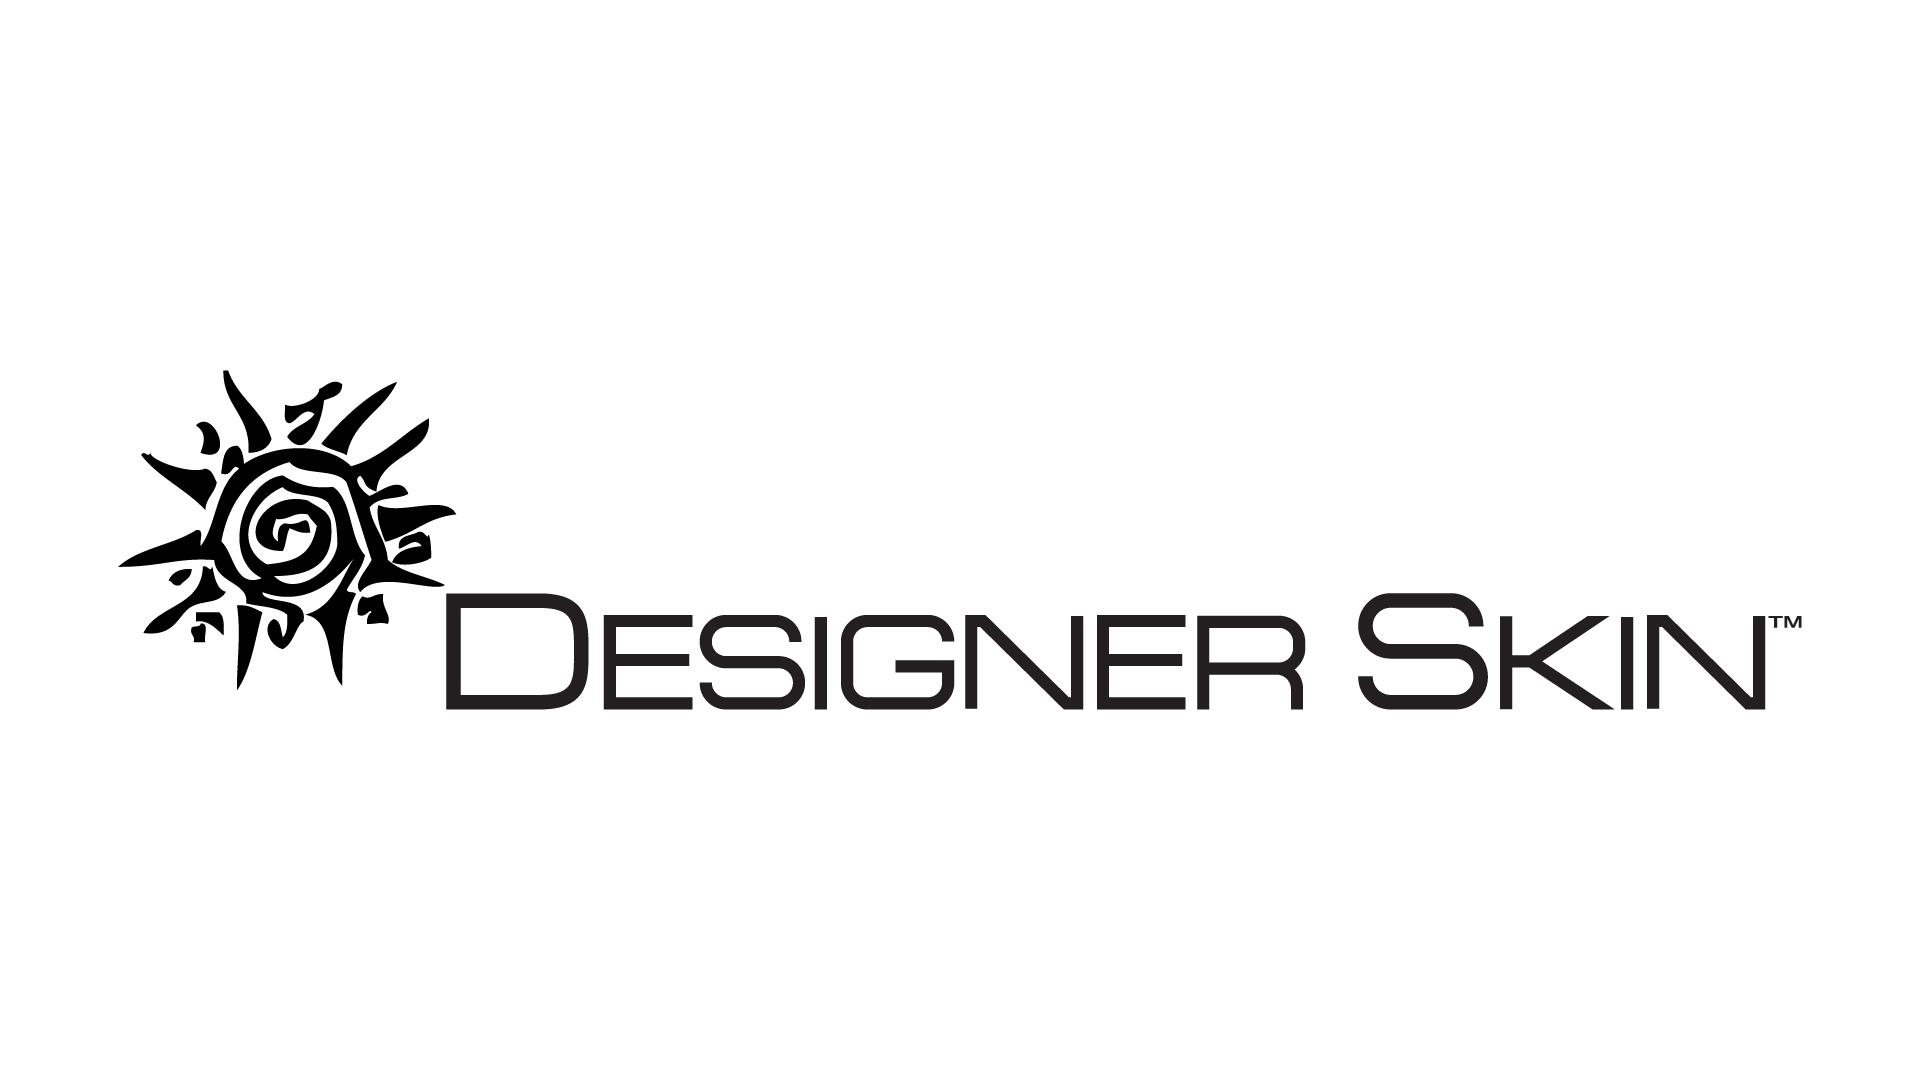 Designer Skin Indoor Tanning Lotions In Hong Kong,Karl Lagerfeld Best Designs